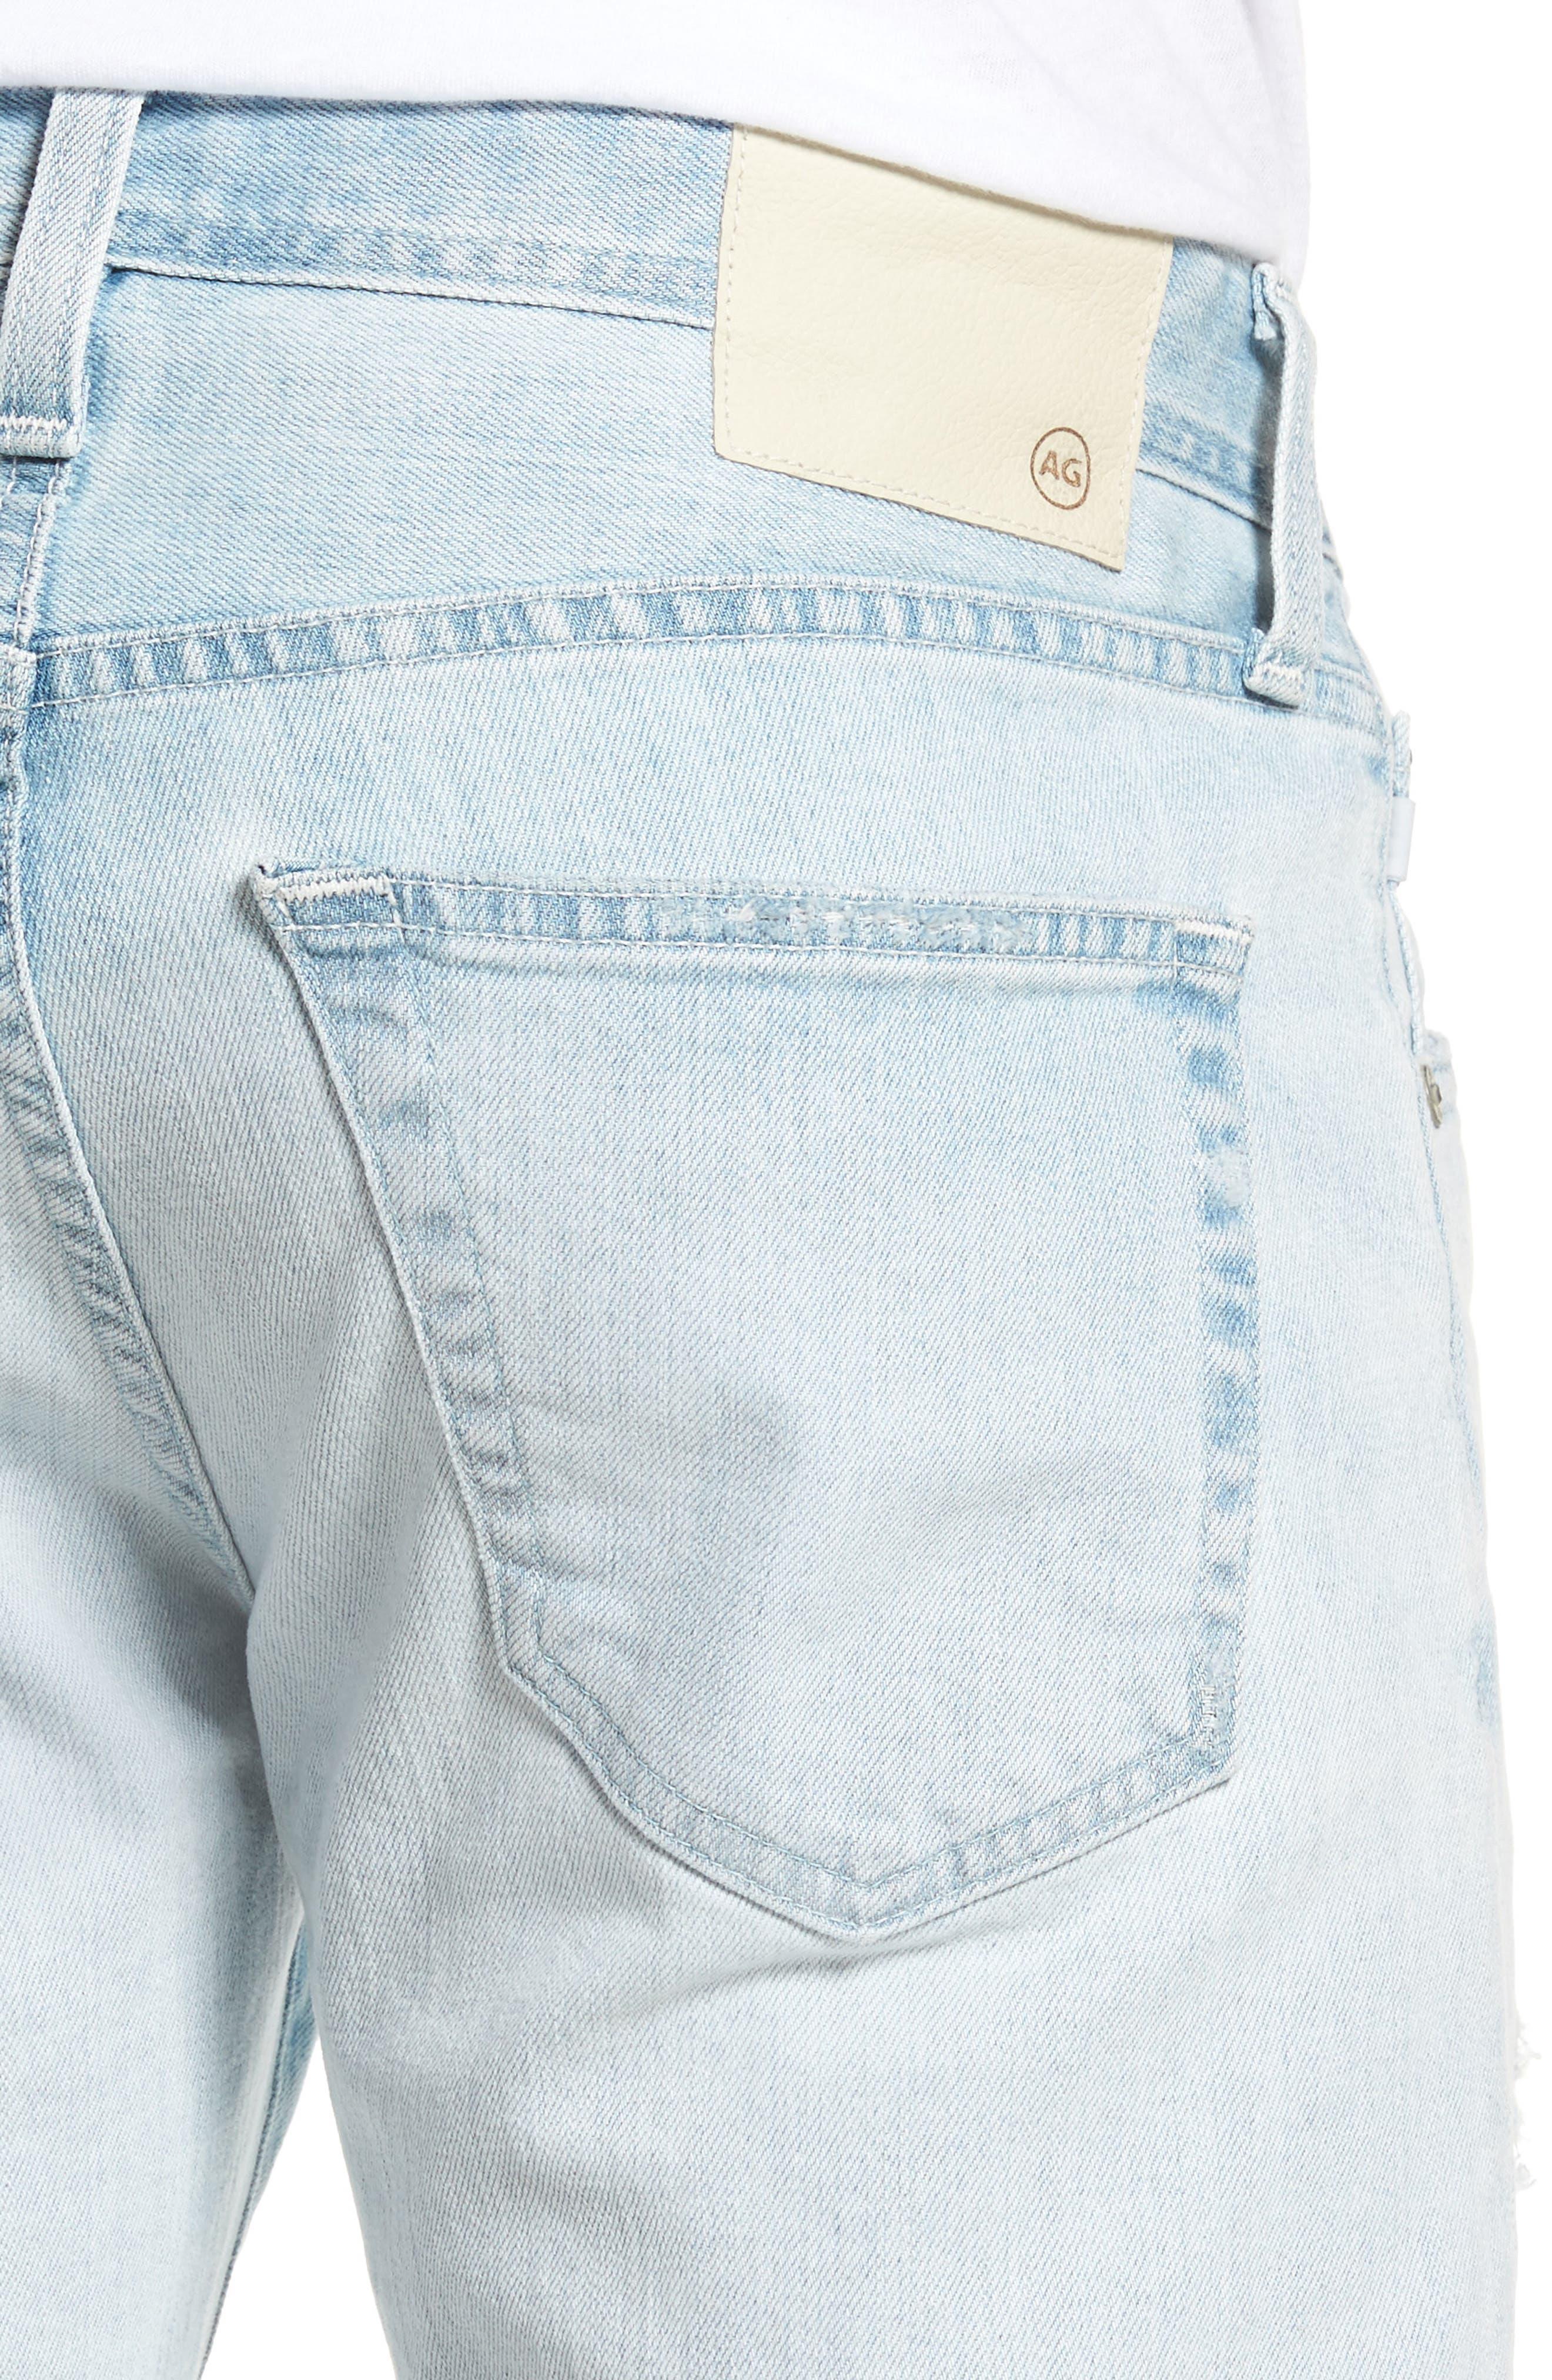 Tellis Slim Fit Jeans,                             Alternate thumbnail 4, color,                             27 Years Surfrider